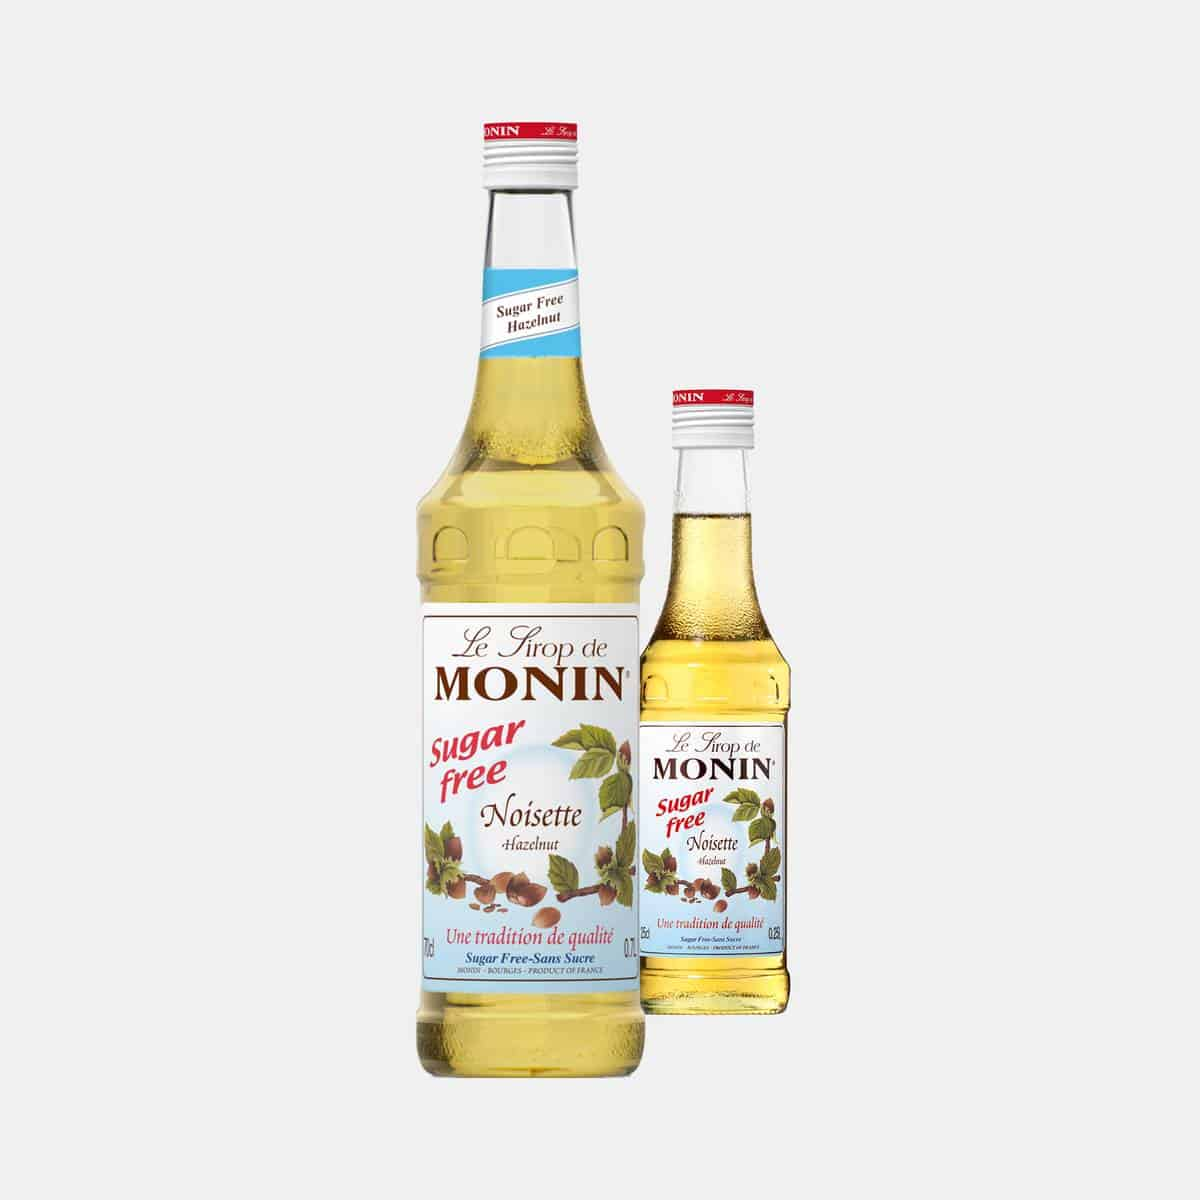 MONIN Sugar Free Hazelnut Syrup Glass Bottles